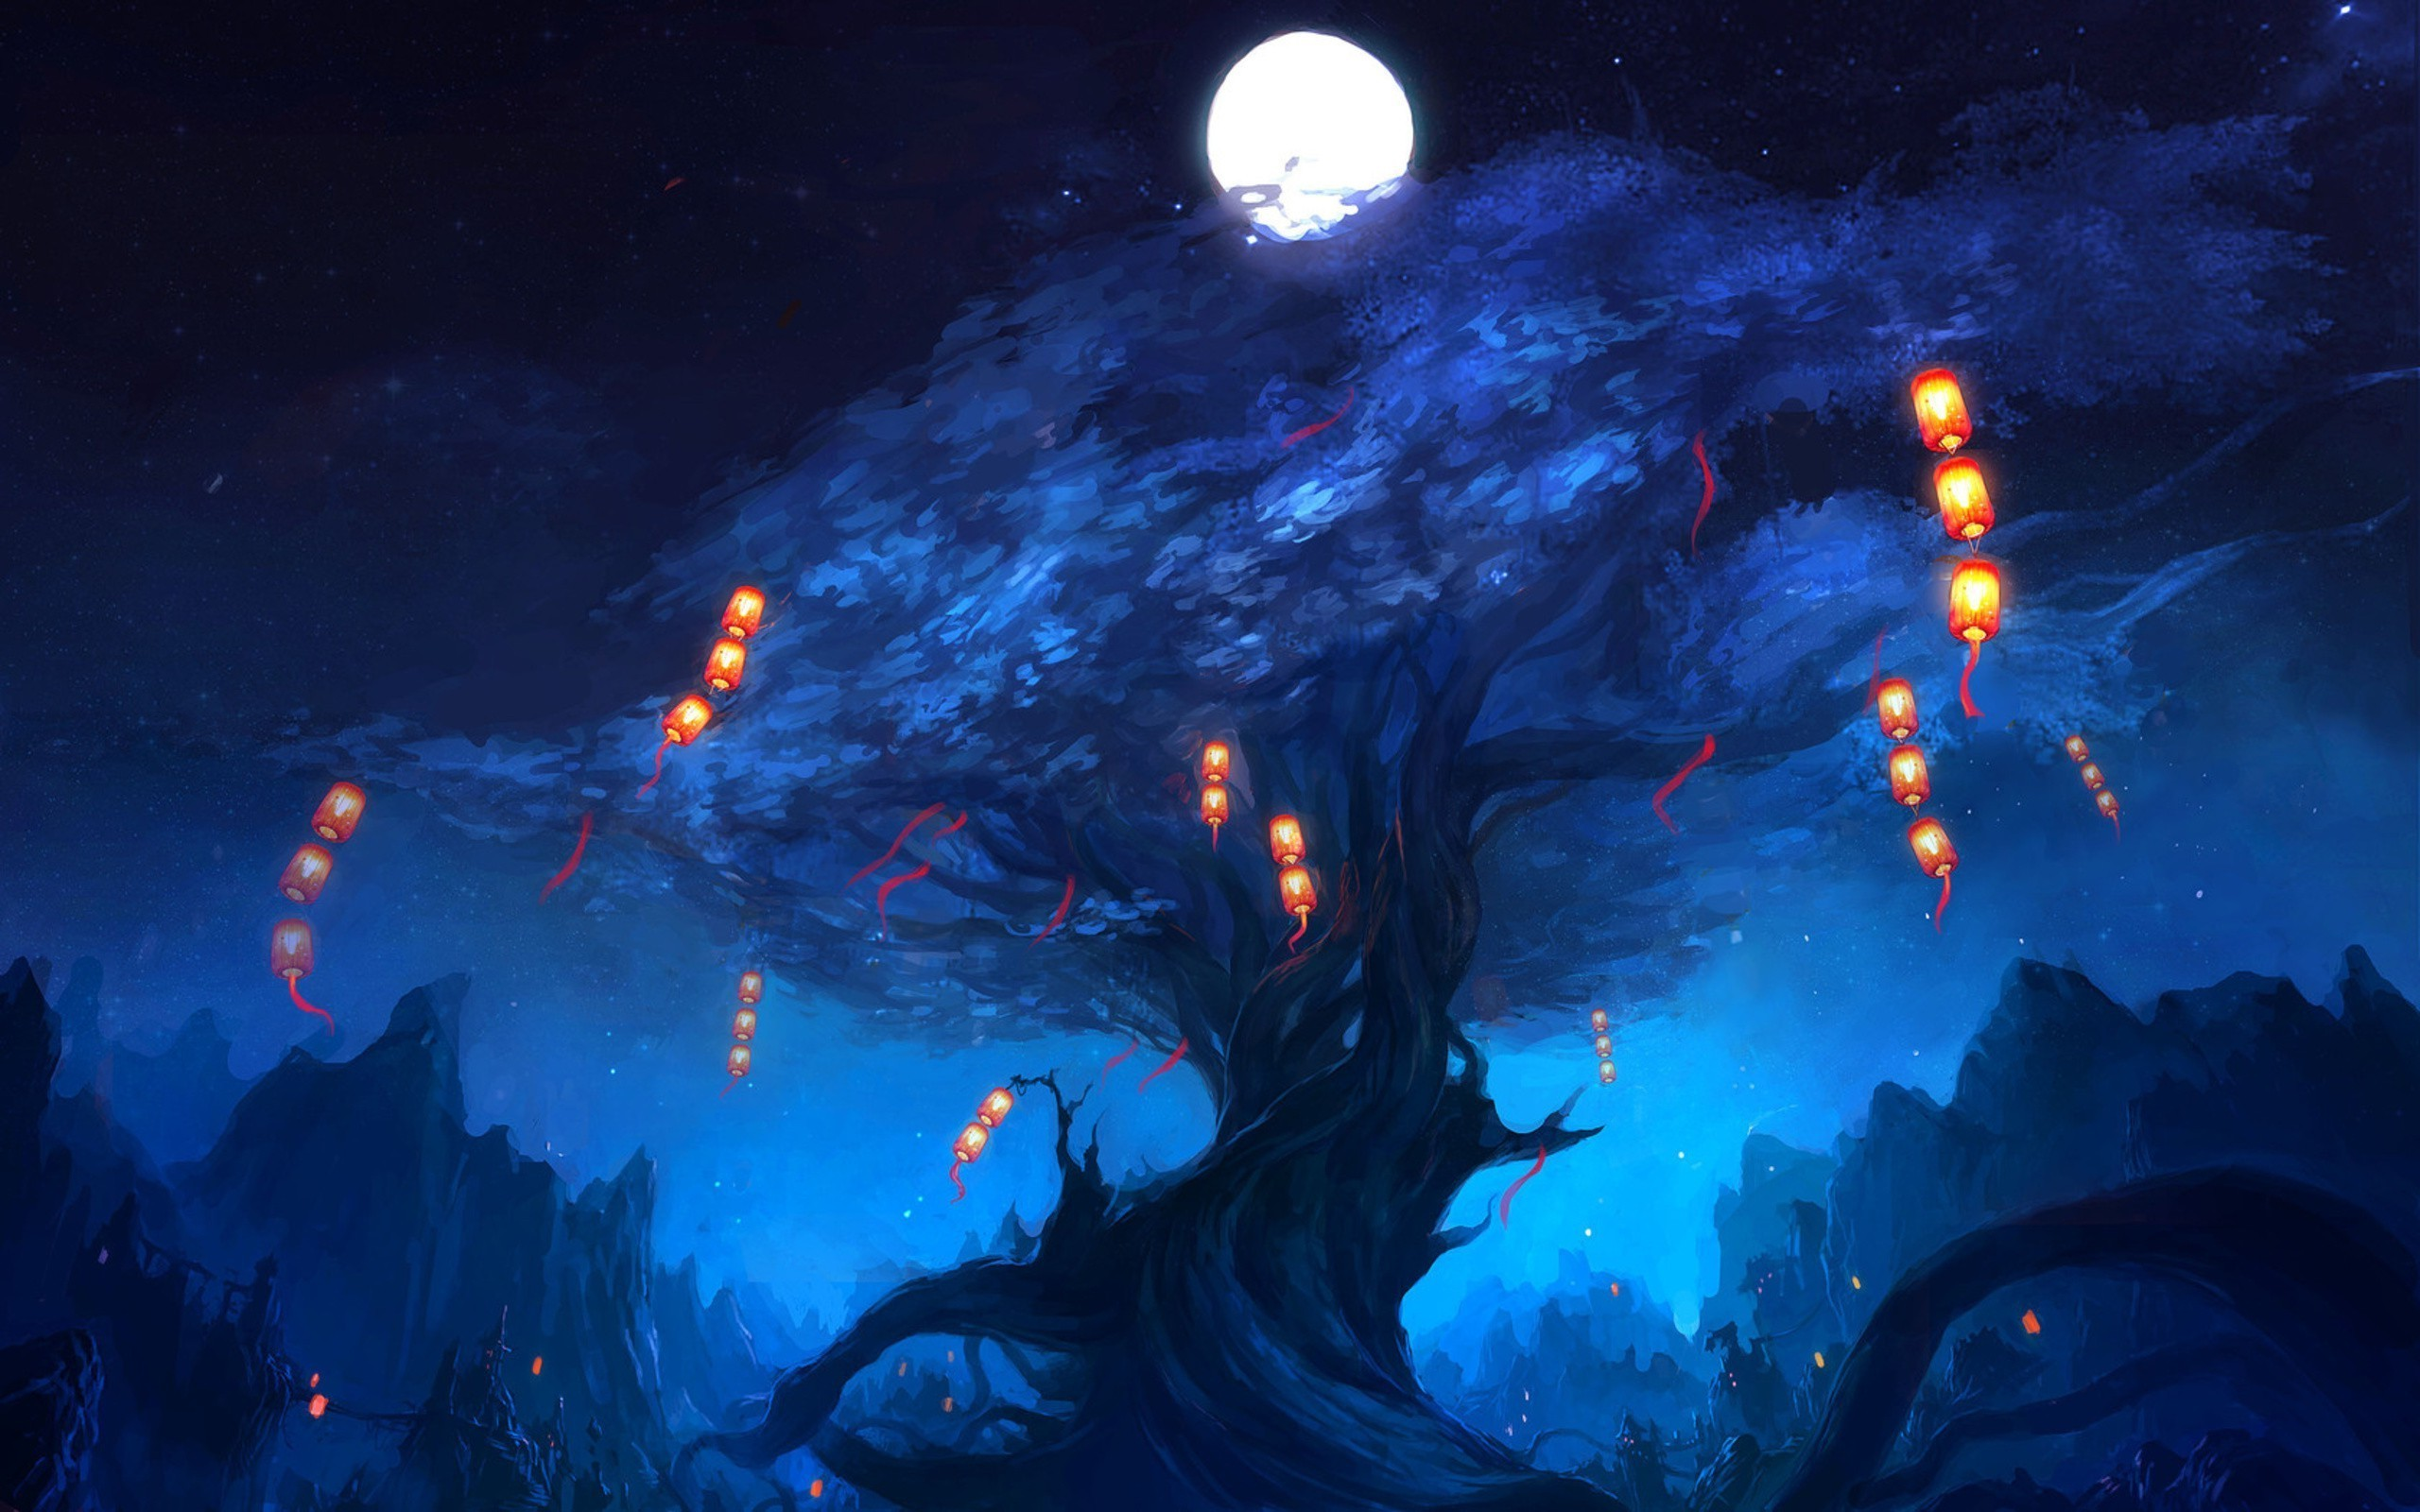 … Lanterns floating around the tree